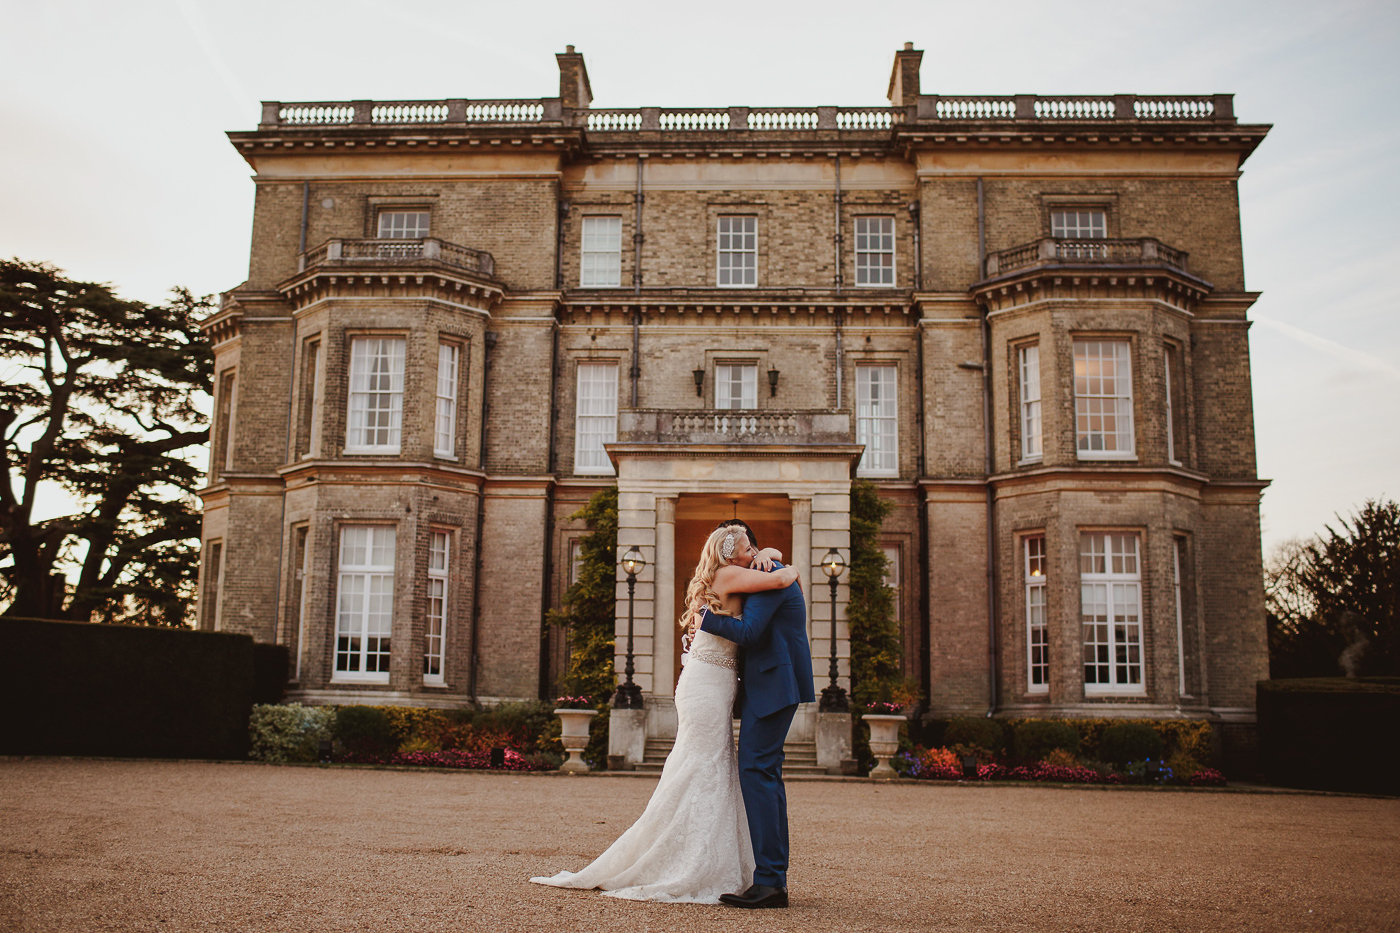 hedsor-house-wedding-photography-26.jpg